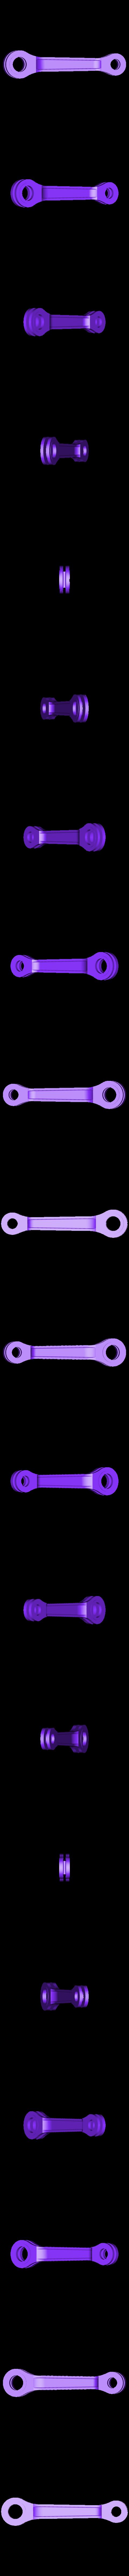 Imtermediate_Rod.STL Download free STL file 4-8-8-4 Big Boy Locomotive • 3D printer object, RaymondDeLuca